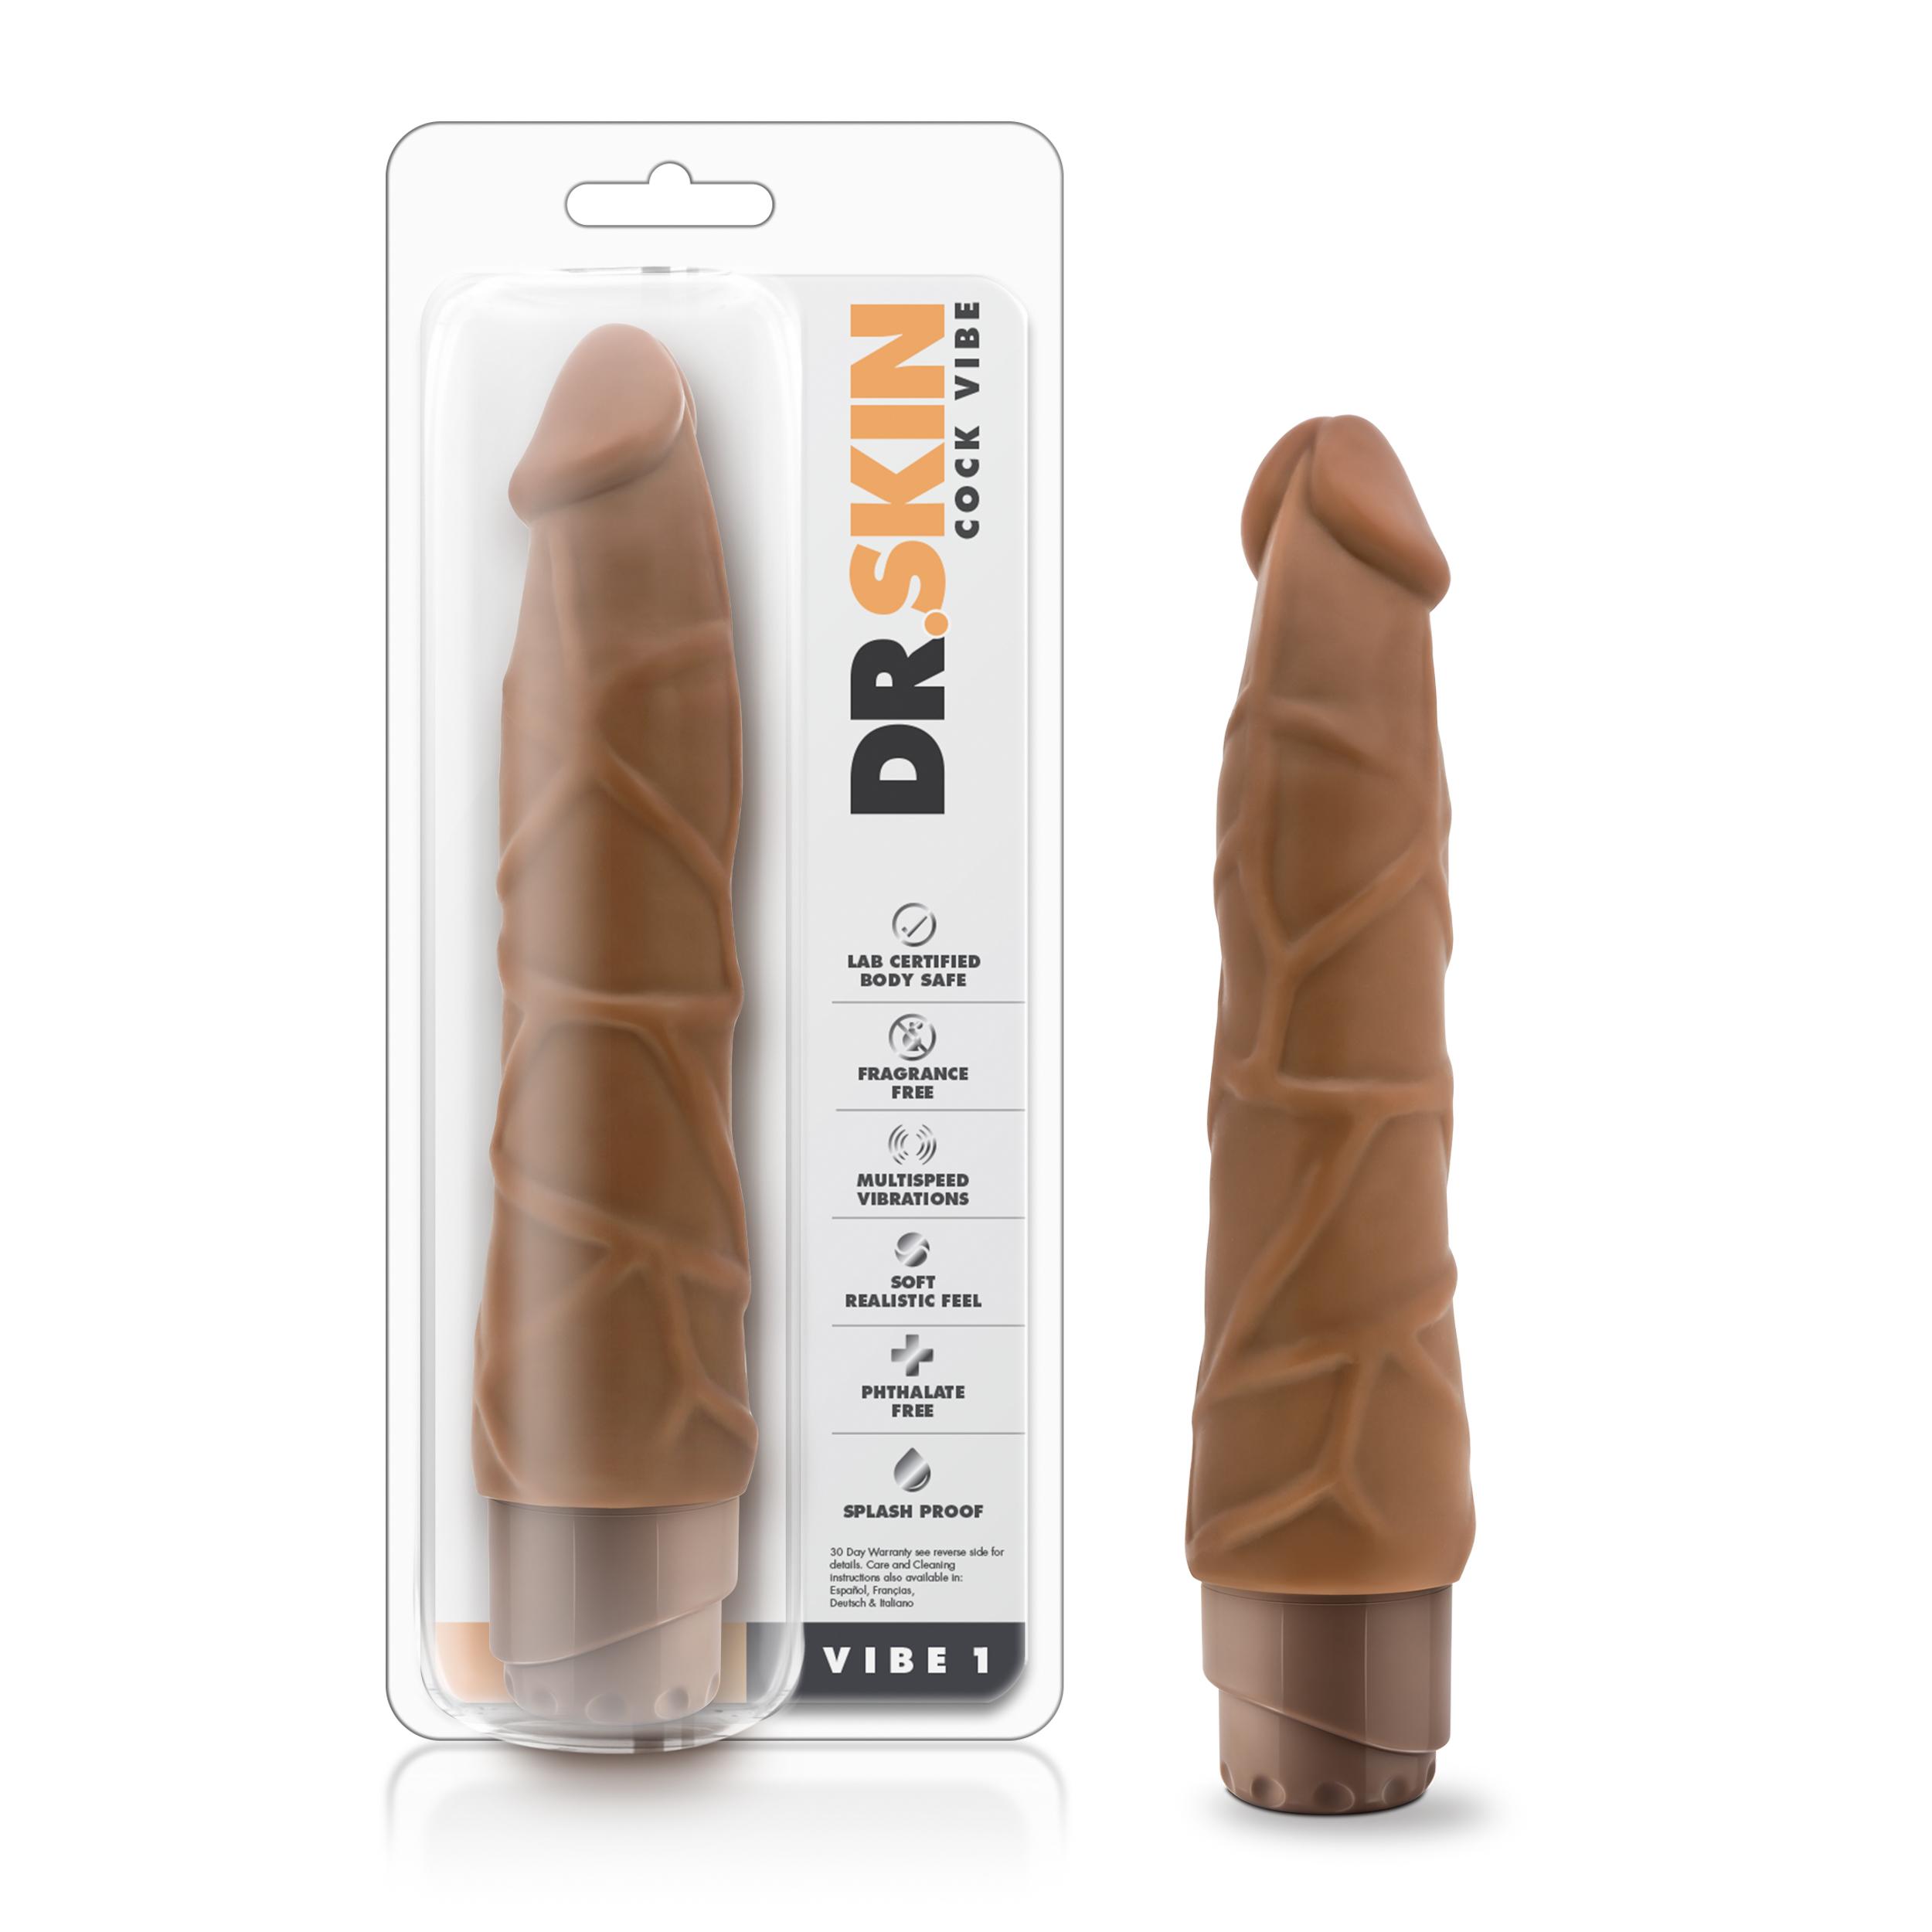 Dr. Skin - Cock Vibe 1 - 9 Inch Vibrating Cock - Mocha